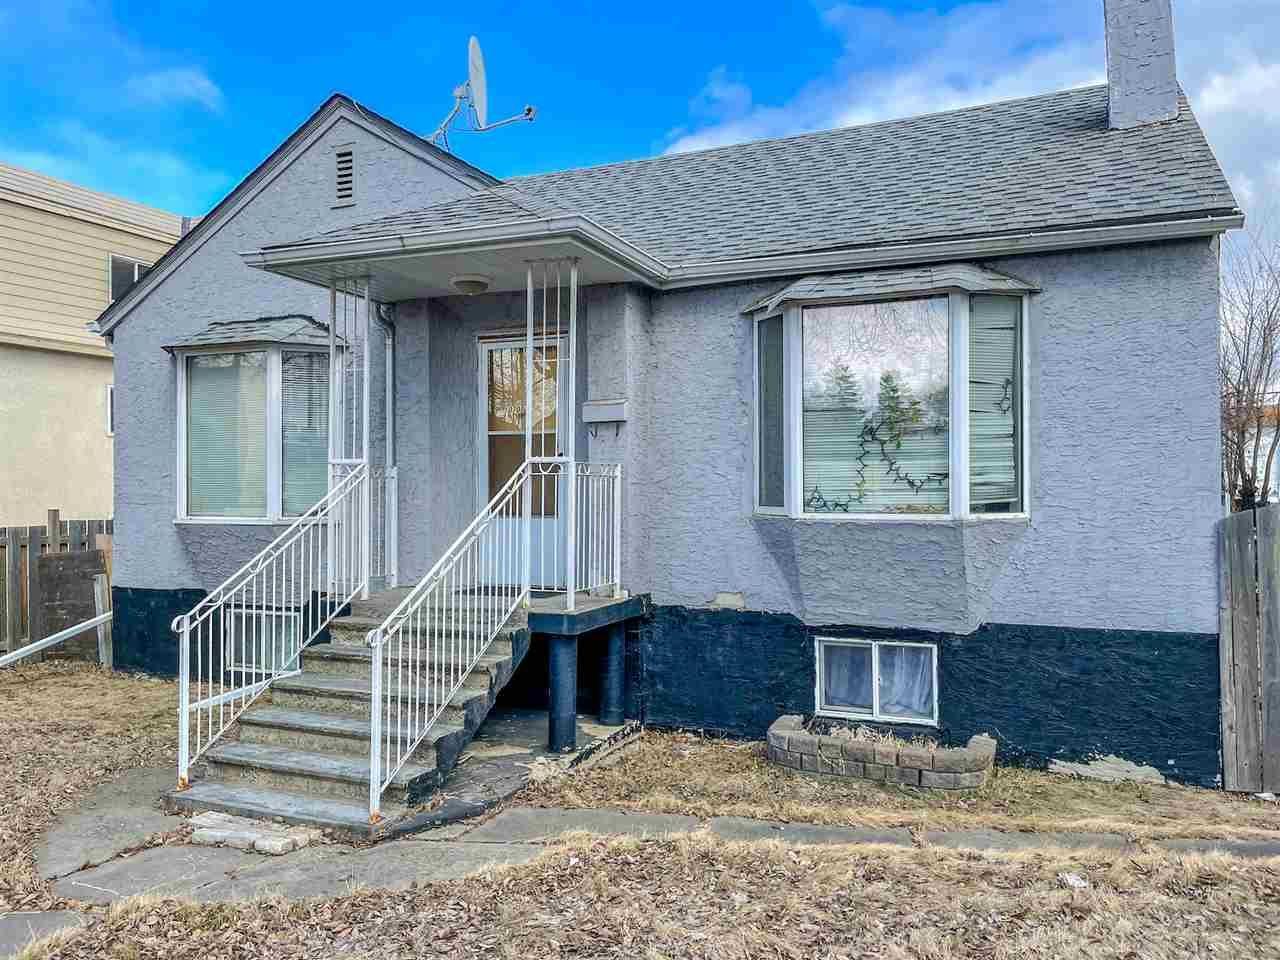 Main Photo: 10709 112 Street in Edmonton: Zone 08 House for sale : MLS®# E4236894